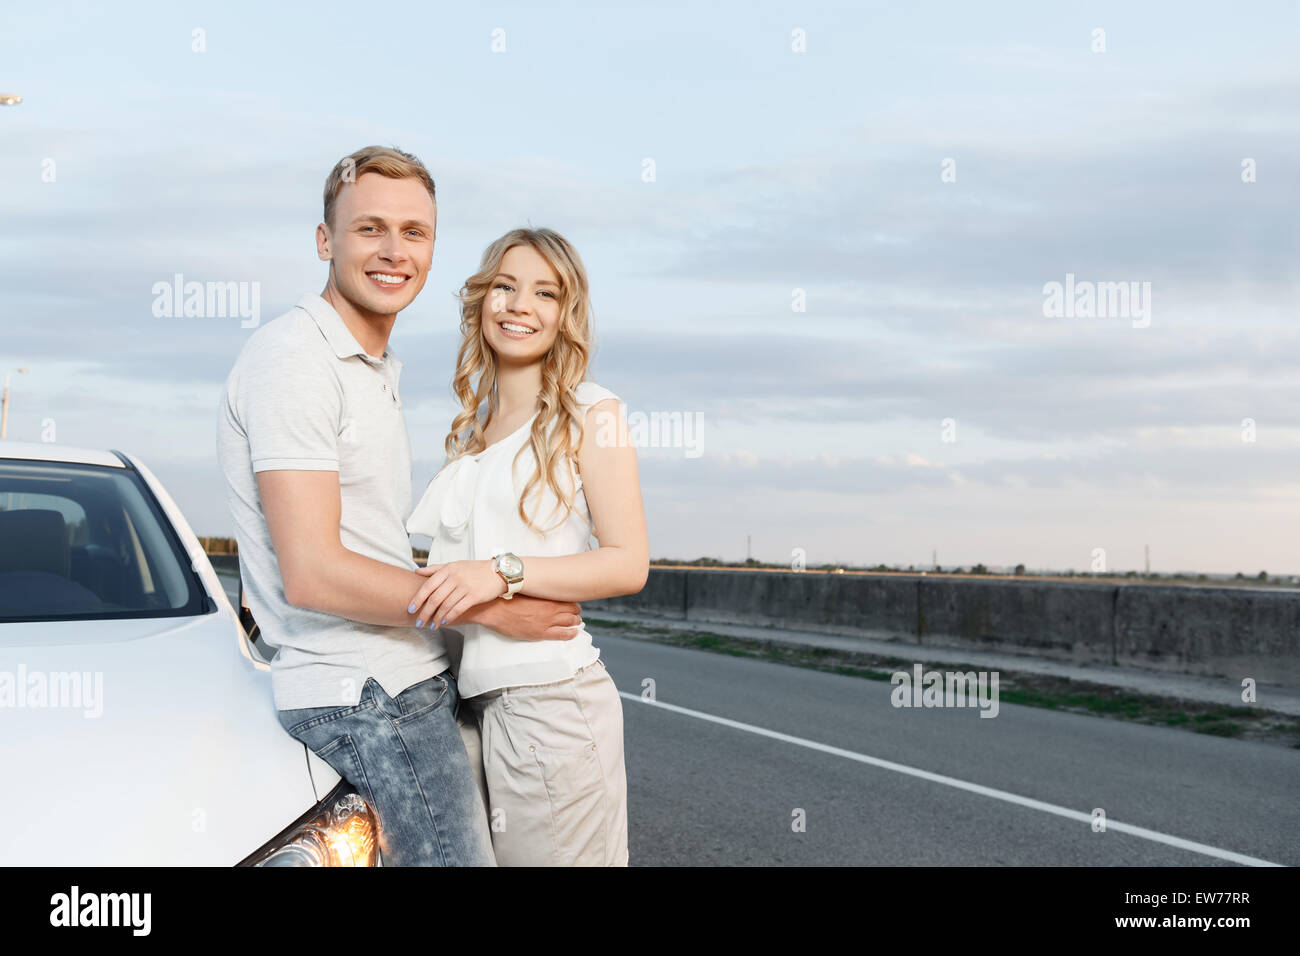 Lovely couple near the car - Stock Image